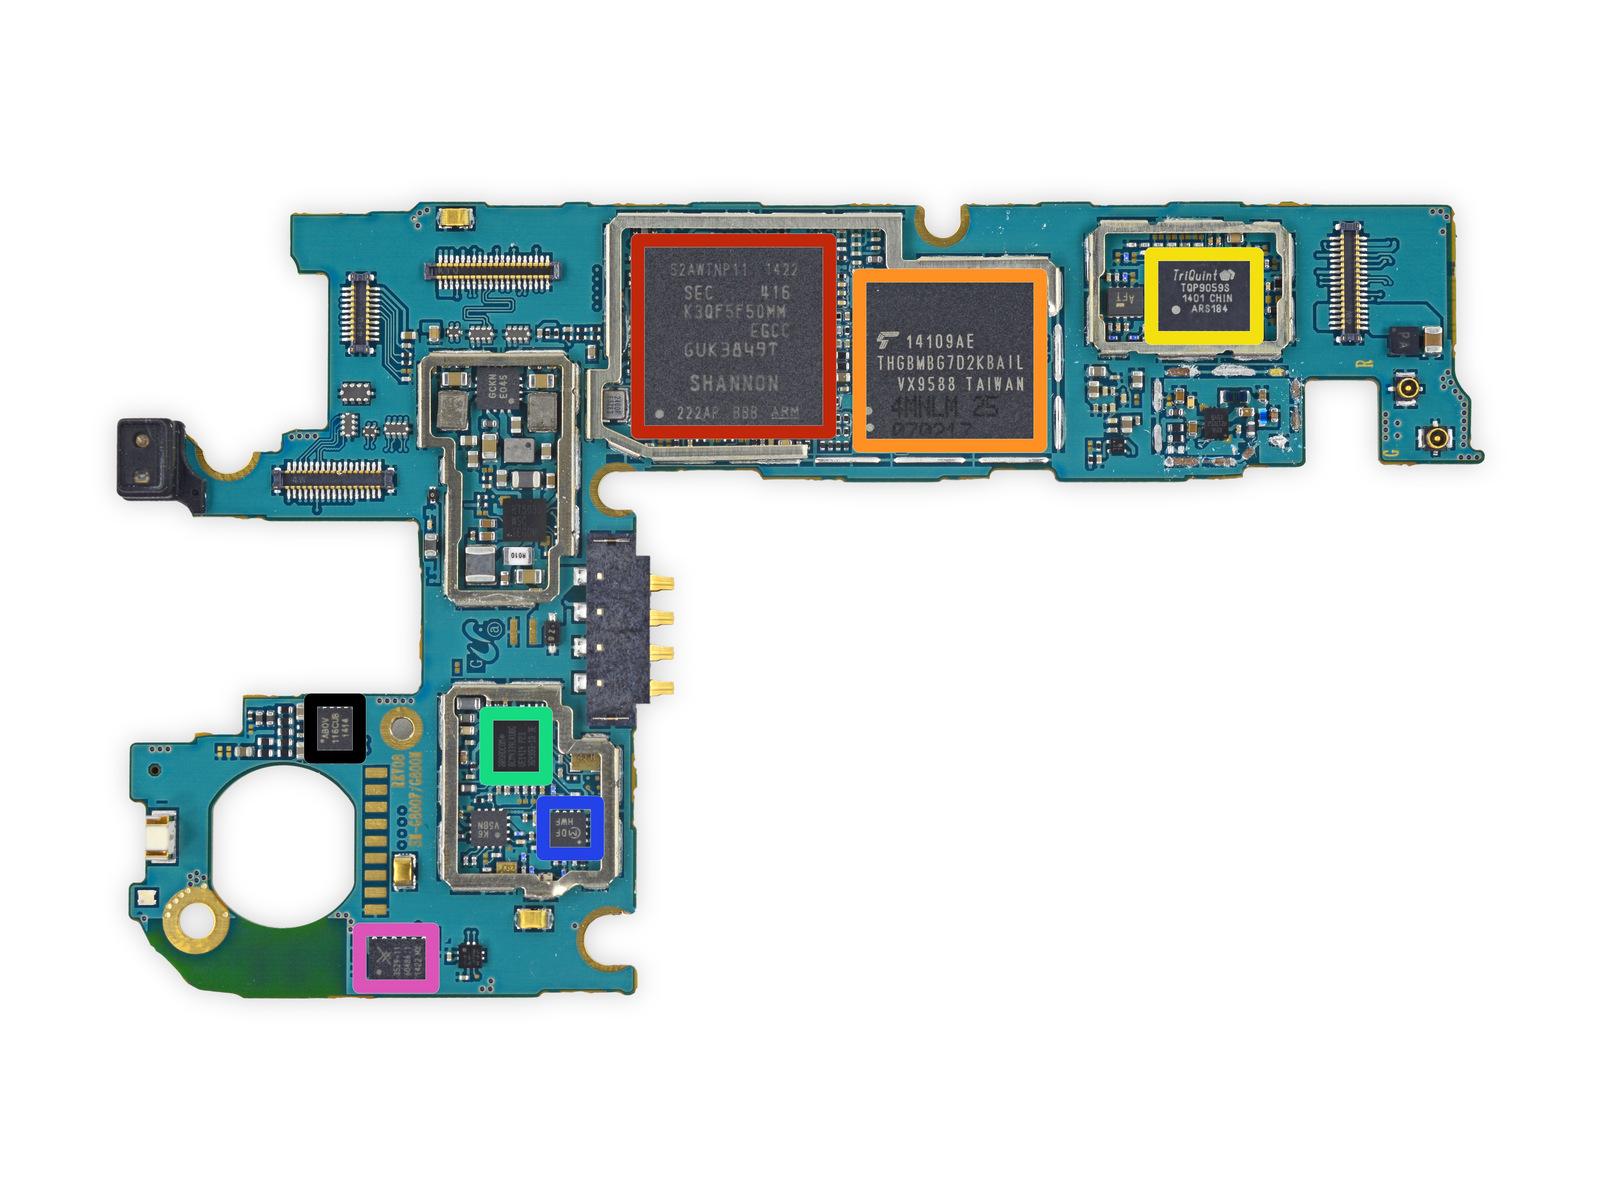 schematic diagrams samsung galaxy s5 sm g900f [ 1600 x 1200 Pixel ]